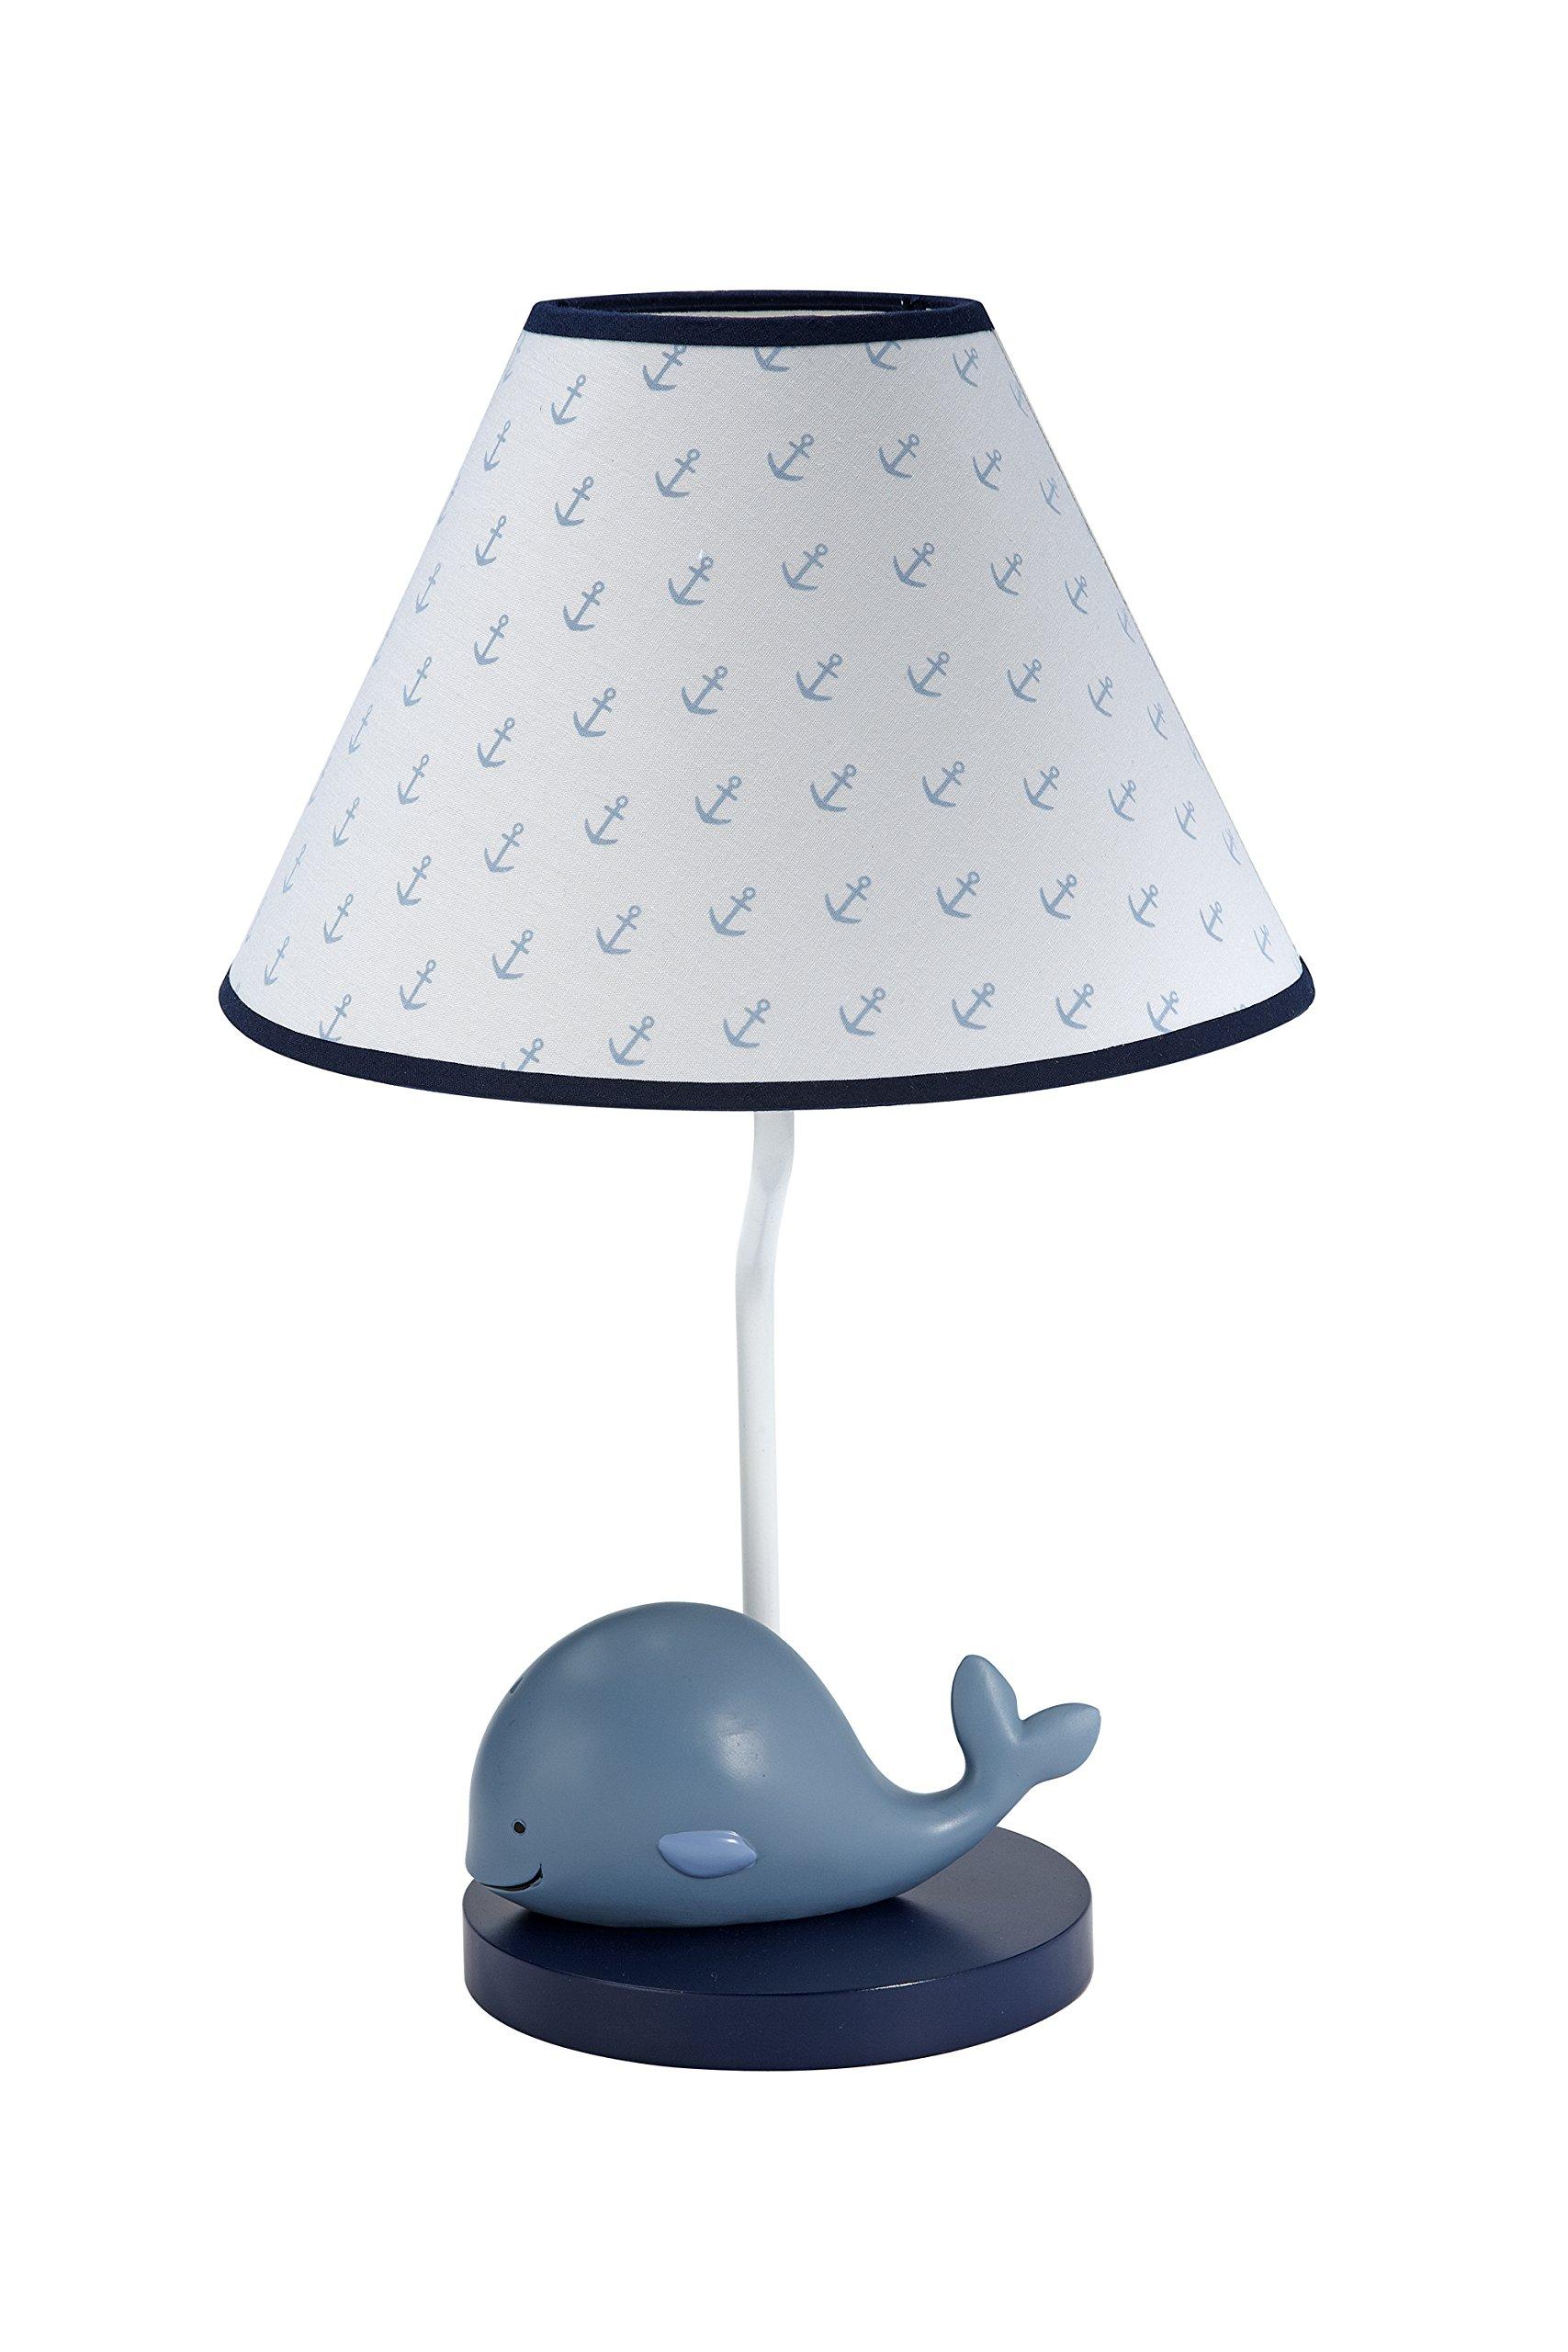 Nautica Kids Brody Nautical/Whale Lamp Base and Shade, Blue/Light Blue/White by Nautica